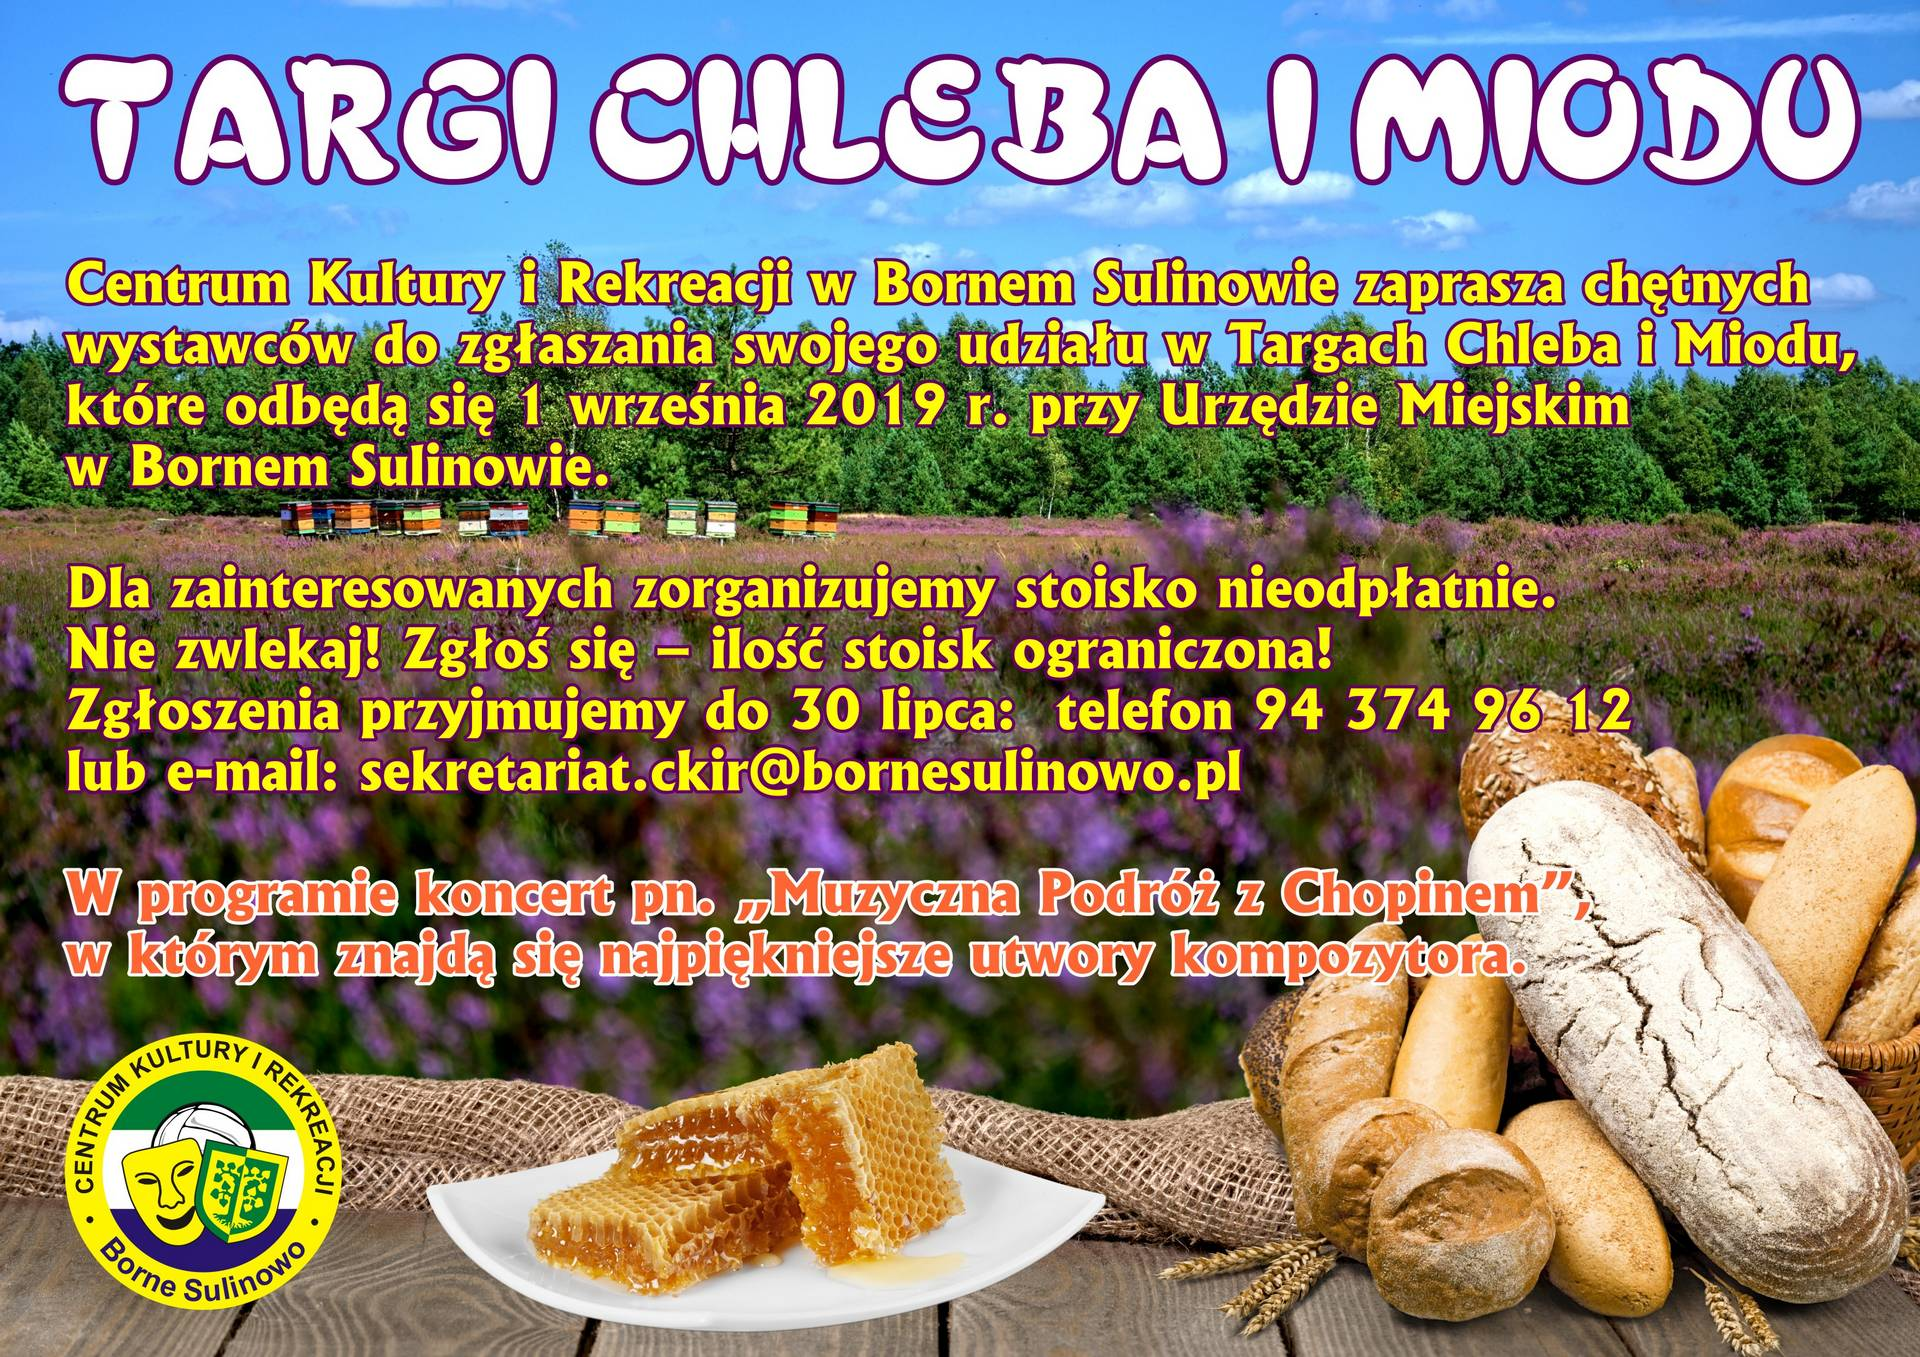 Targi Chleba i Miodu